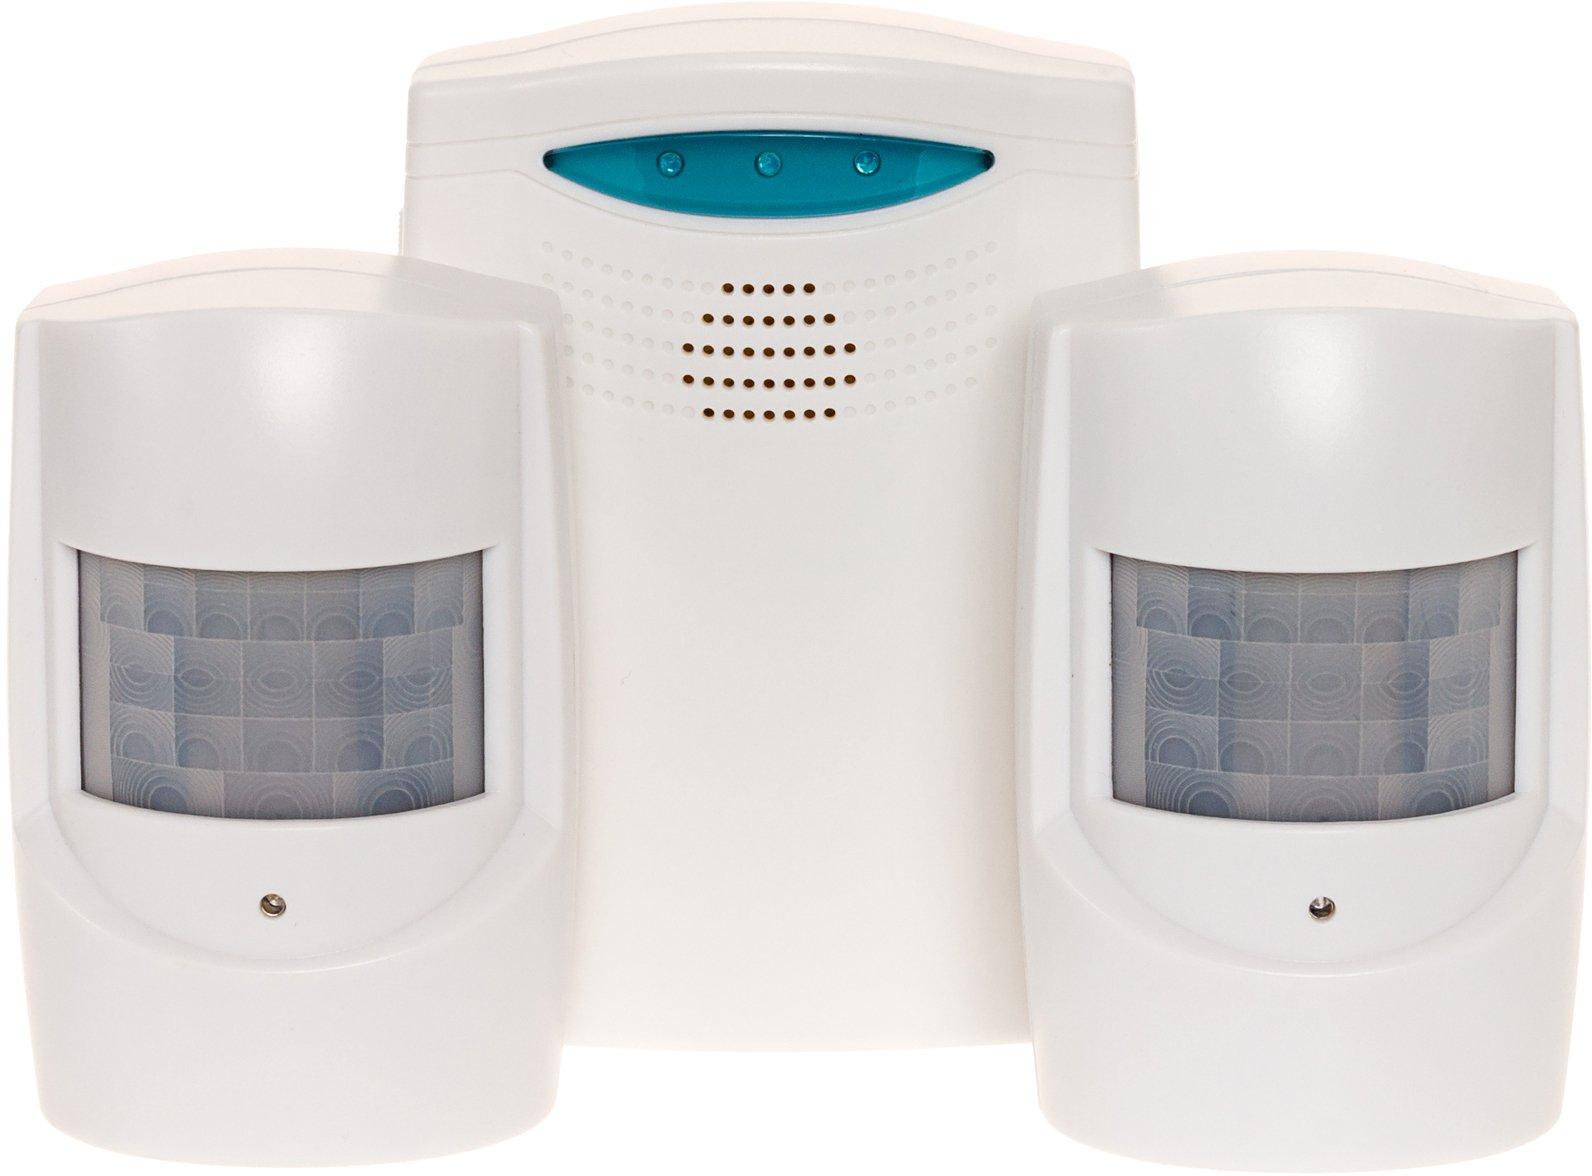 Wireless Home Security System - 1x Alarm + 2x Sensor Set by Reusable Revolution